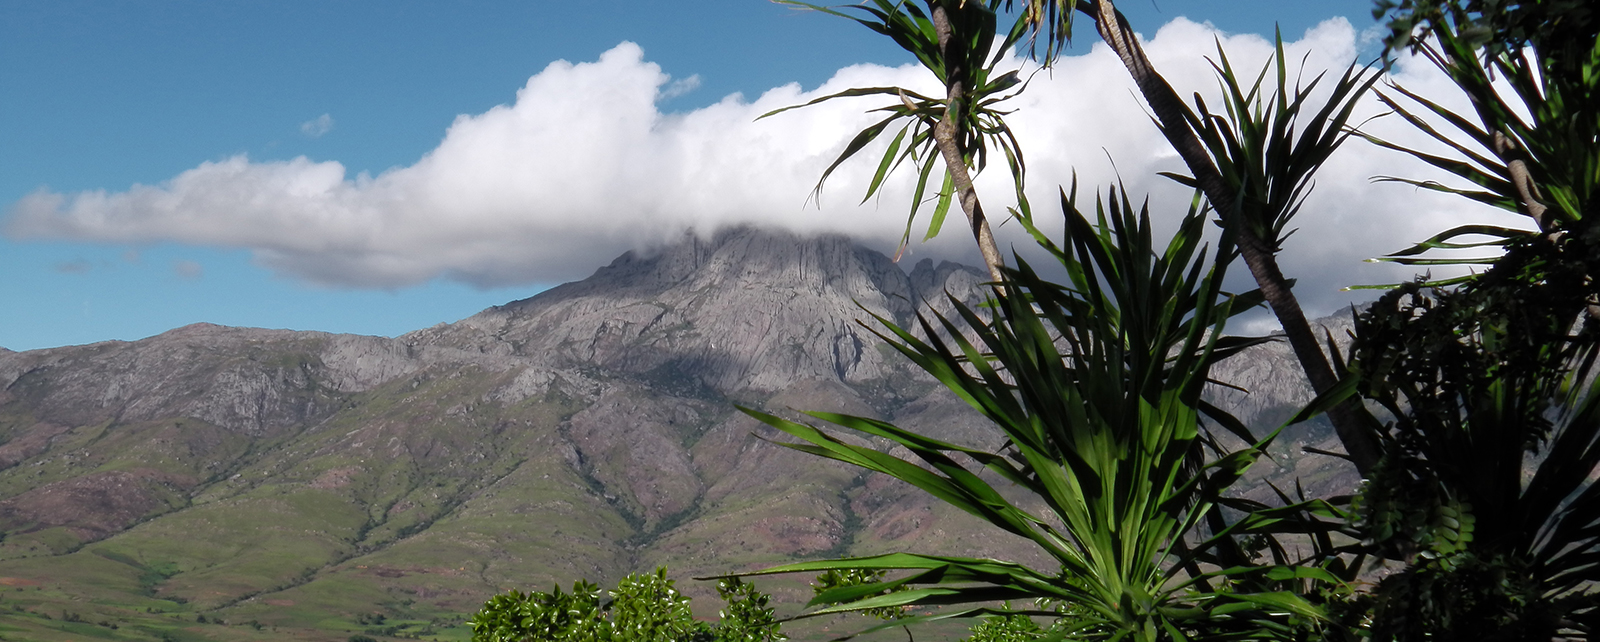 Montagne - Tsarasoa Lodge Madagascar